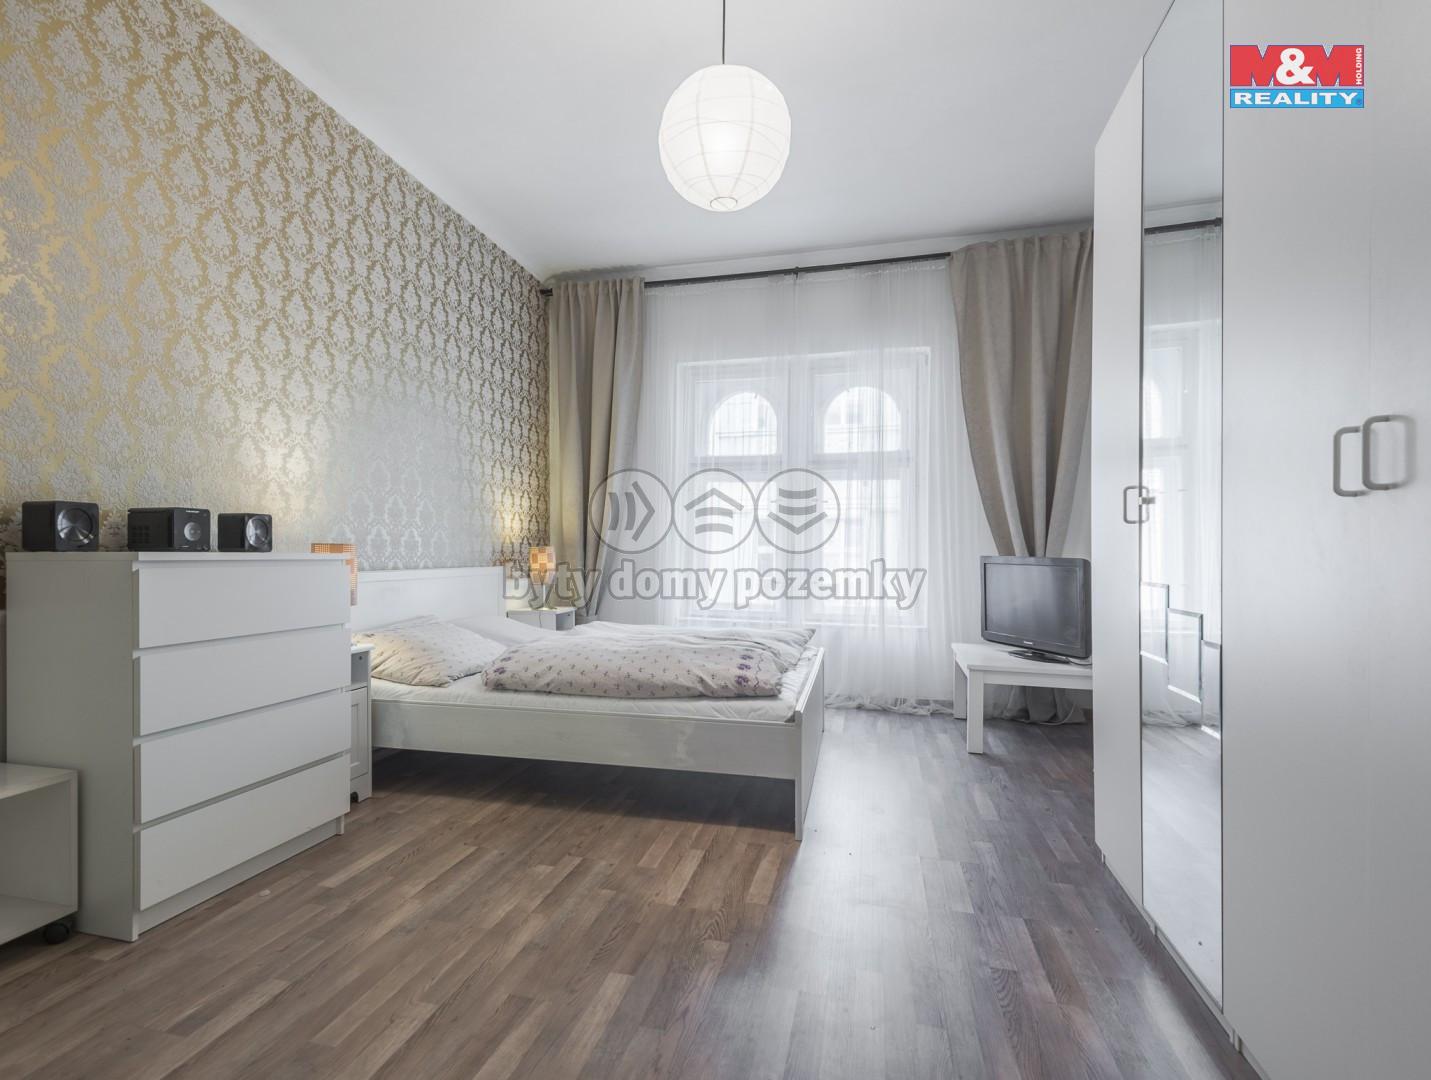 Pronájem bytu 1+kk, 37 m2, Žižkov